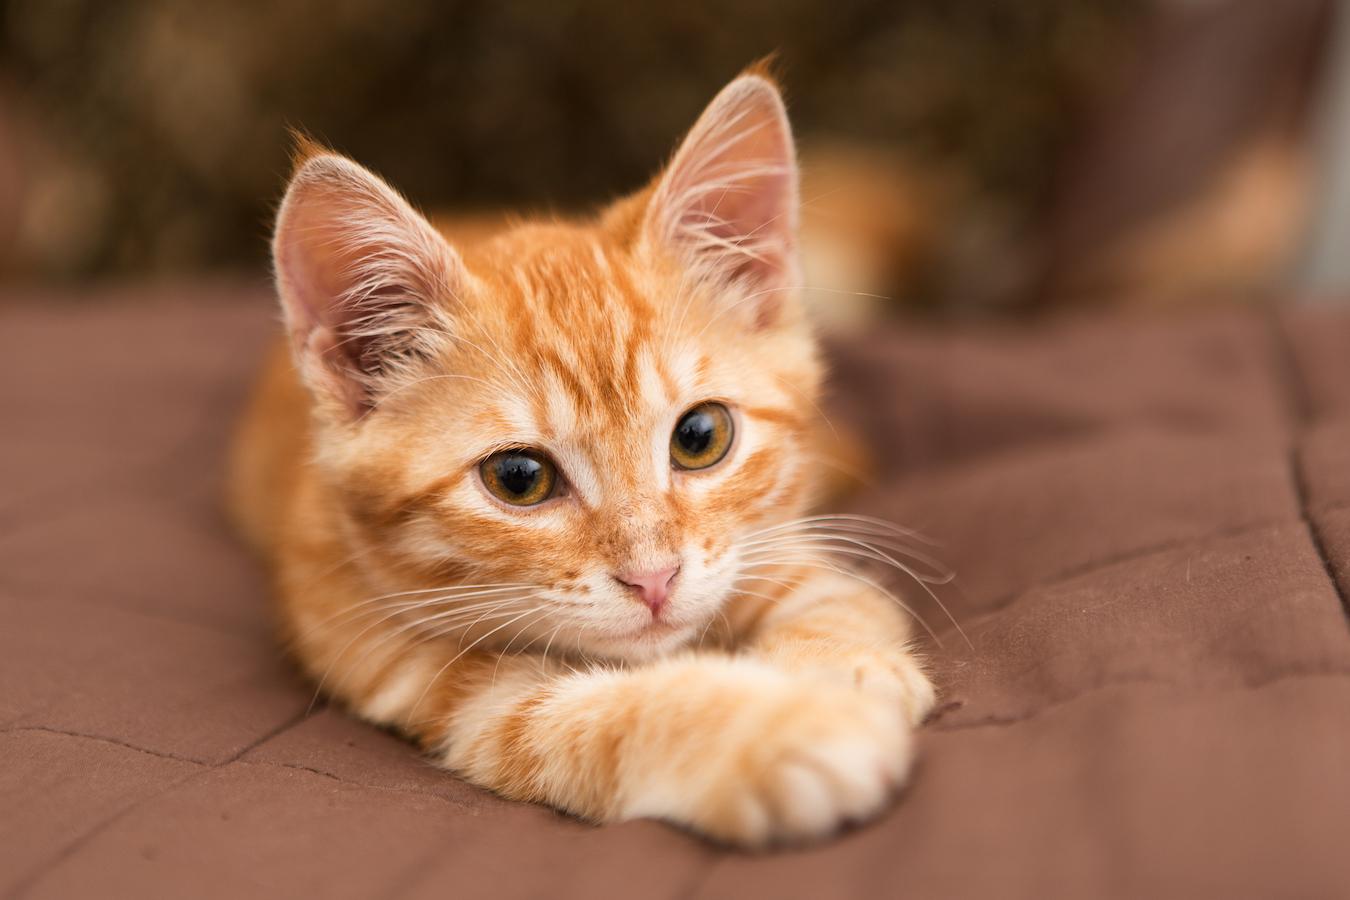 Little orange kitten lie on the bed